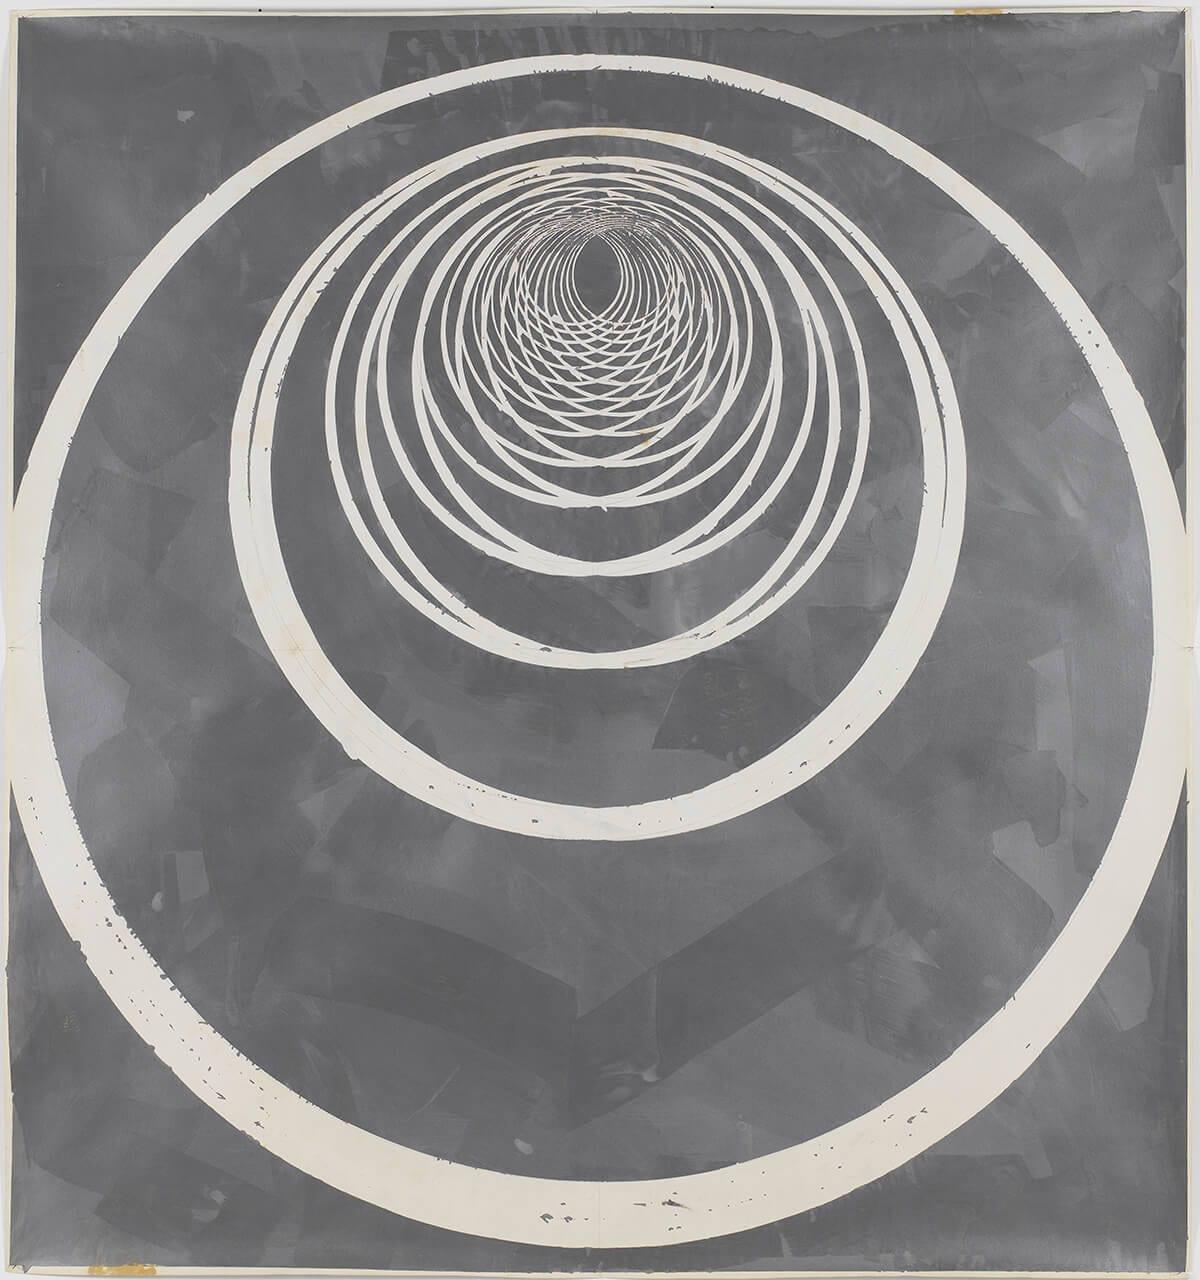 Luis Frangella, Geometrico, 1980